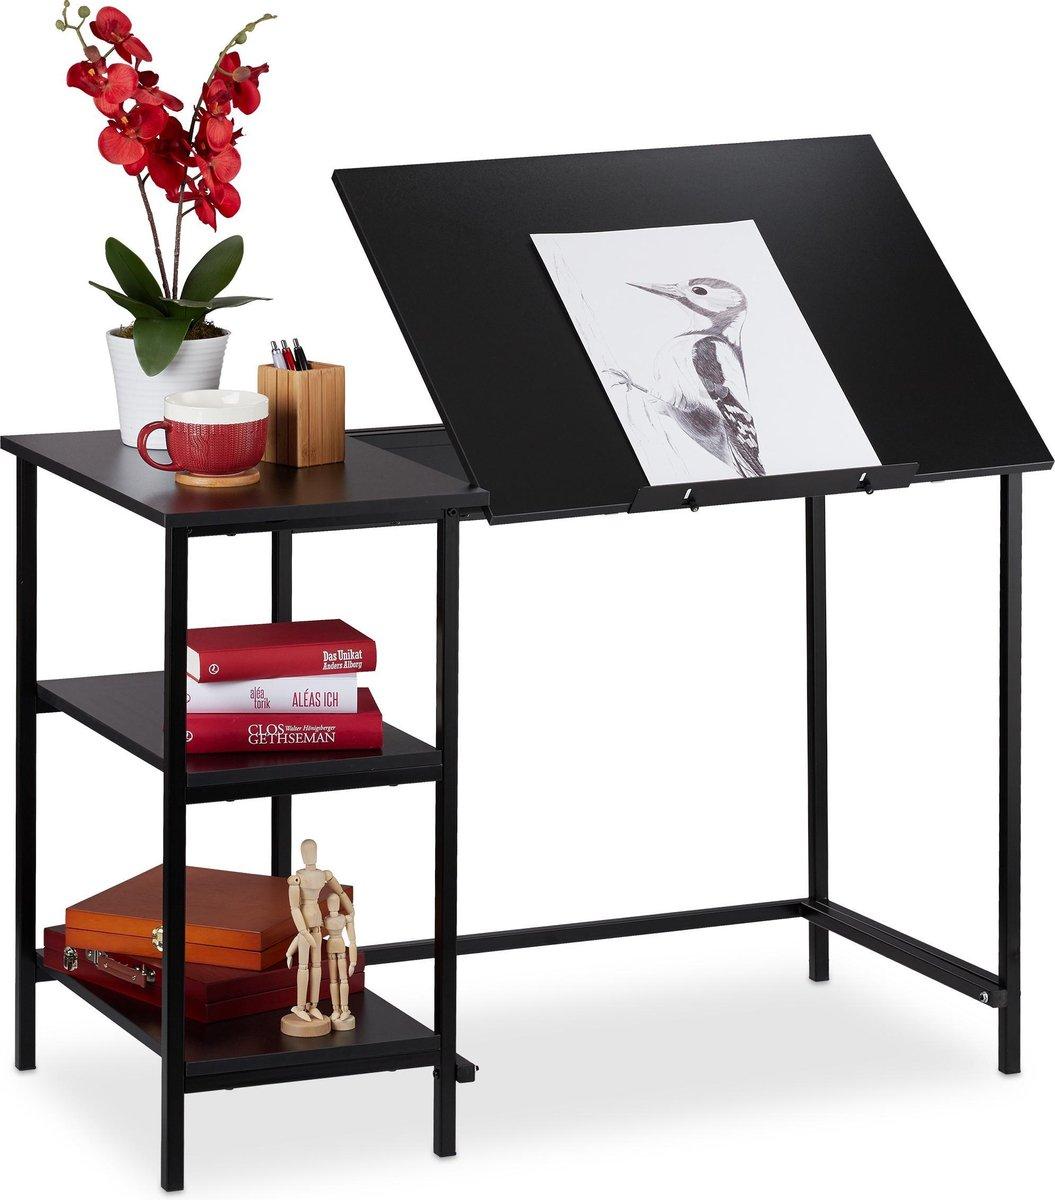 relaxdays bureau kantelbaar - tekentafel - computertafel - laptoptafel - 3 vakken Zwart / zwart